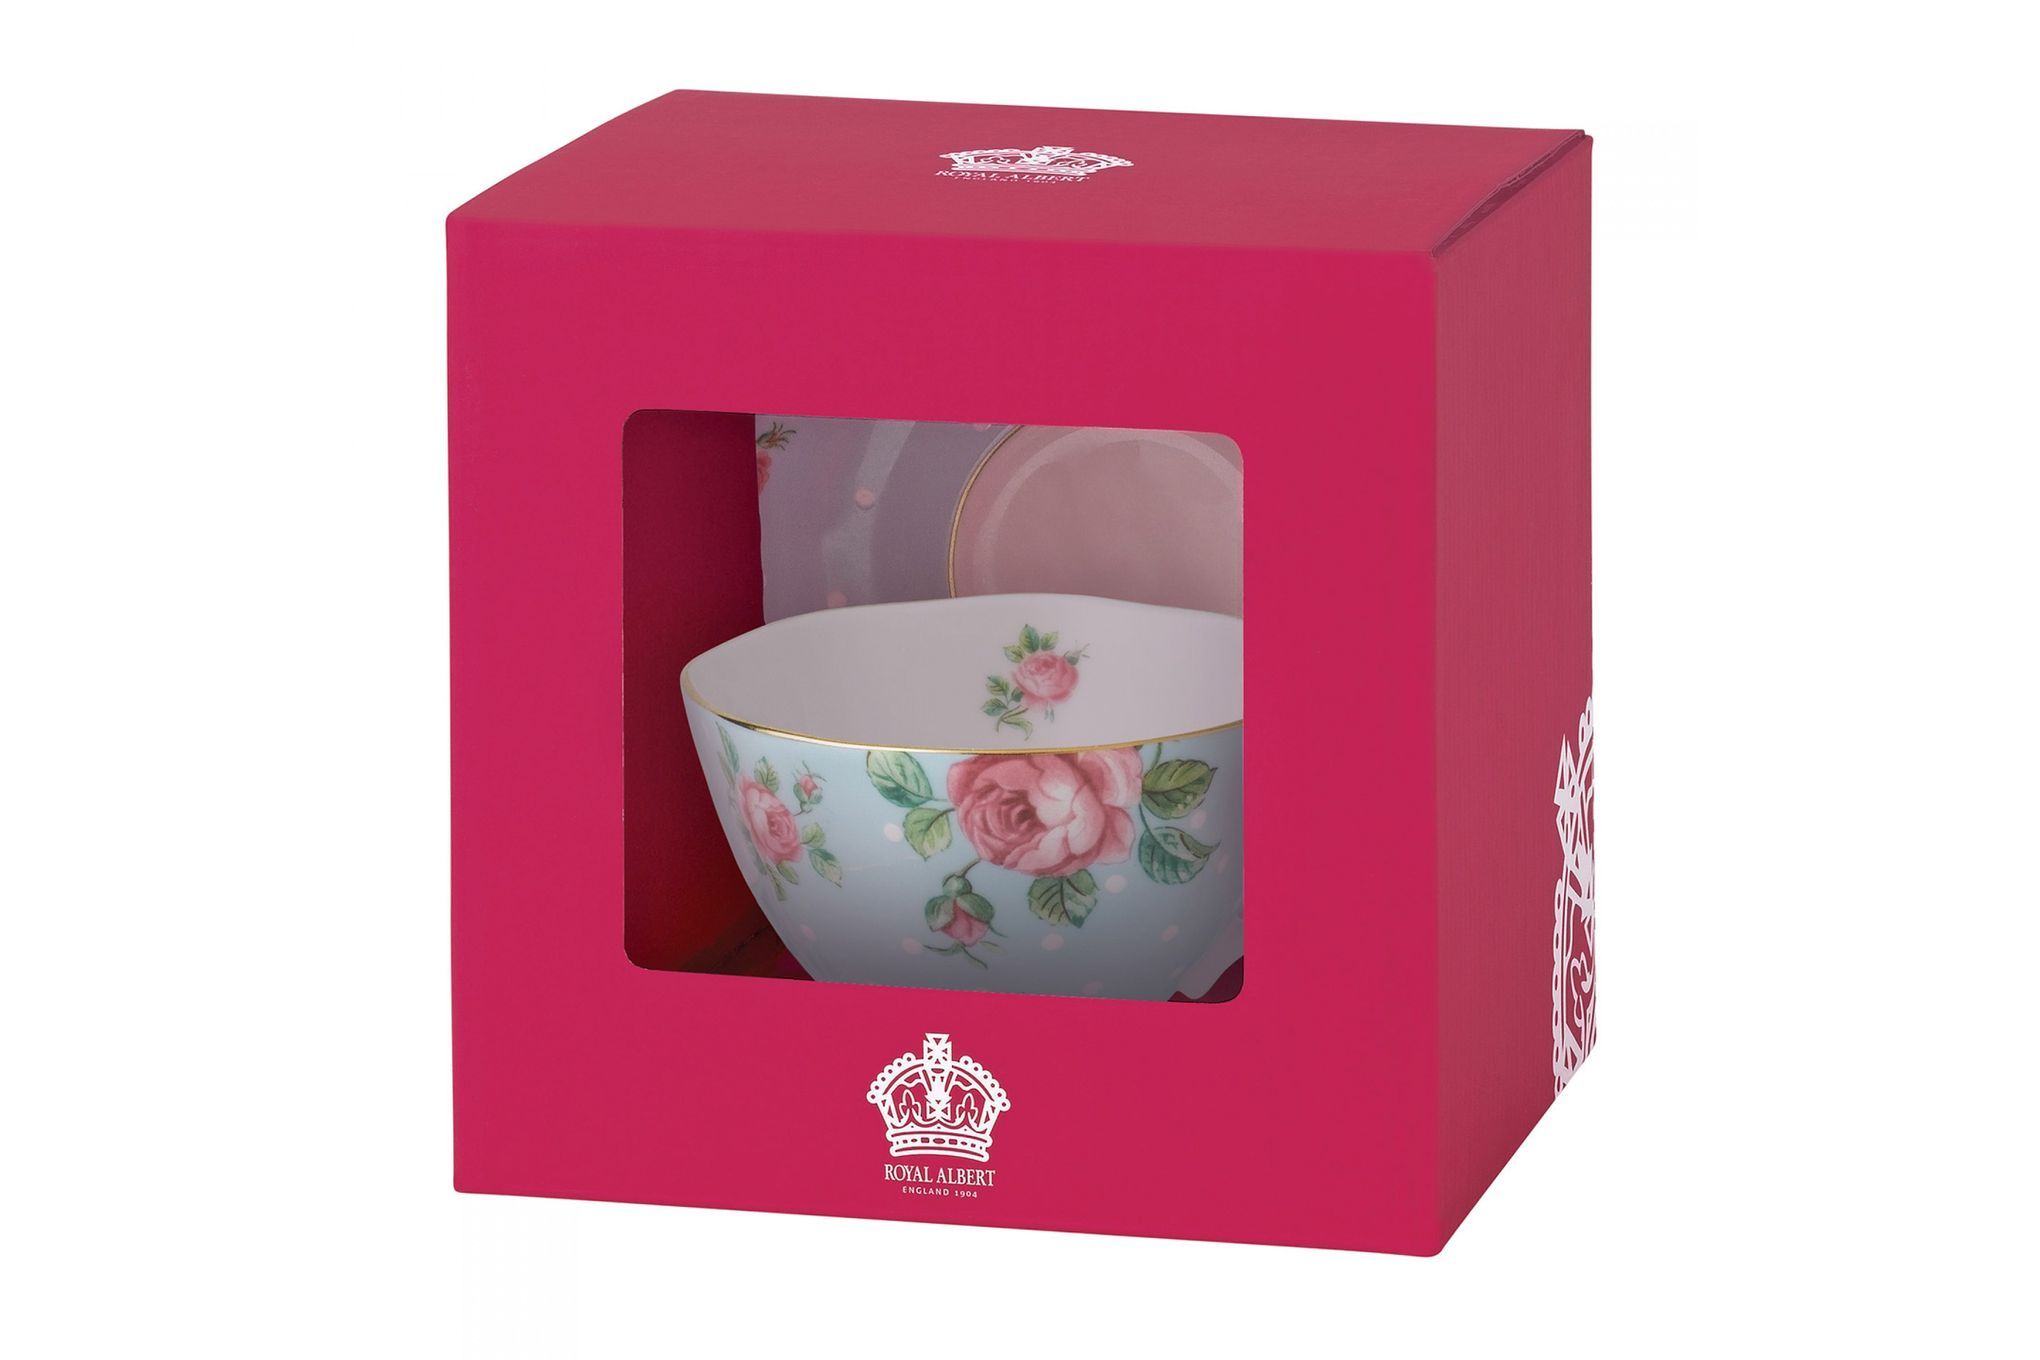 Royal Albert Polka Blue Teacup & Saucer Boxed thumb 2